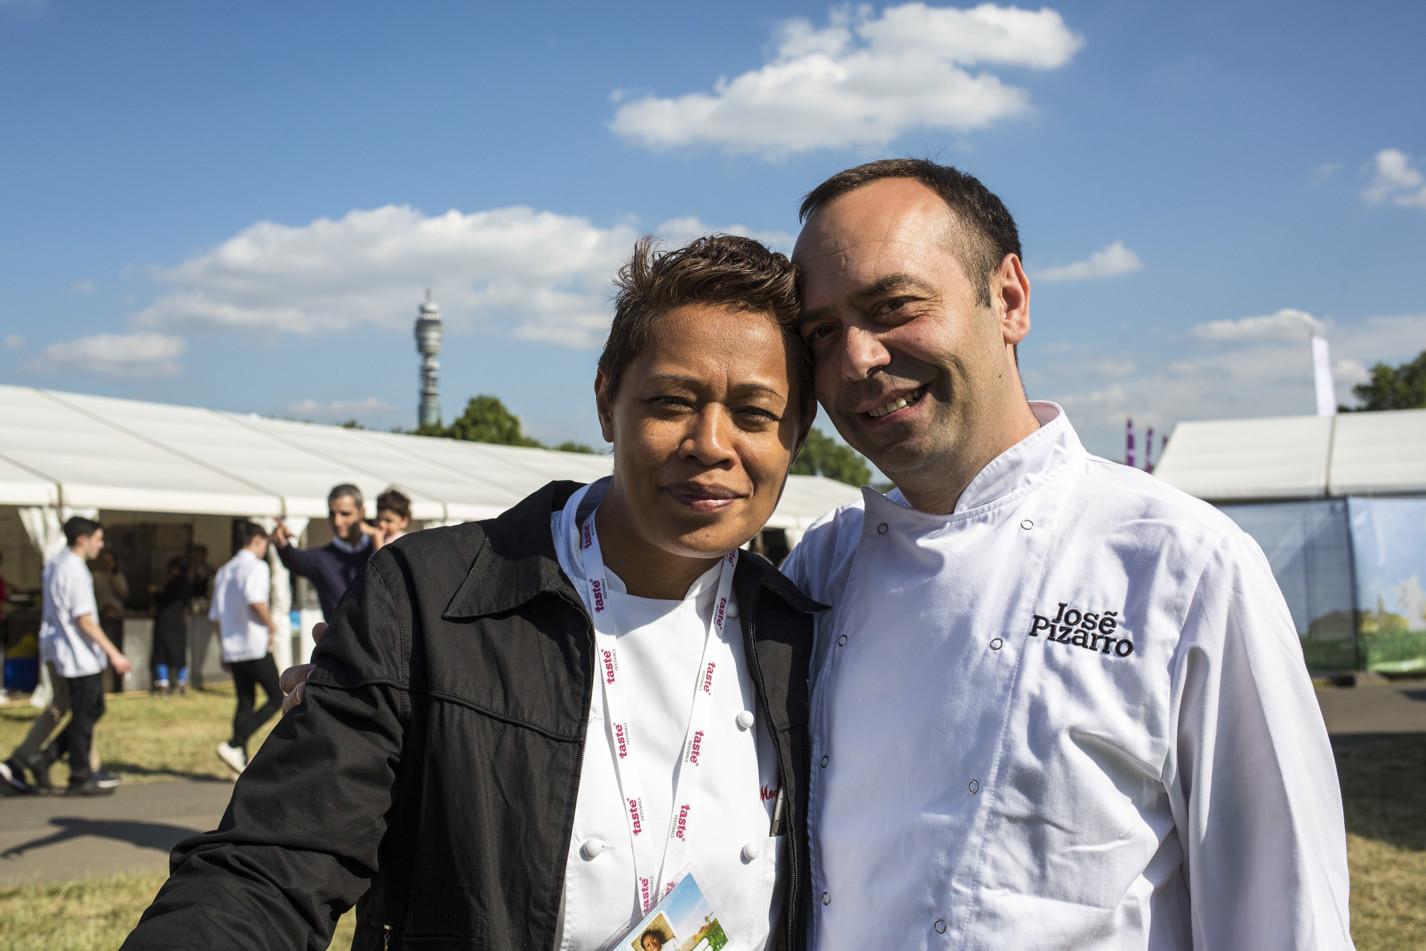 Monica Galetti and Jose Pizarro at Taste of London